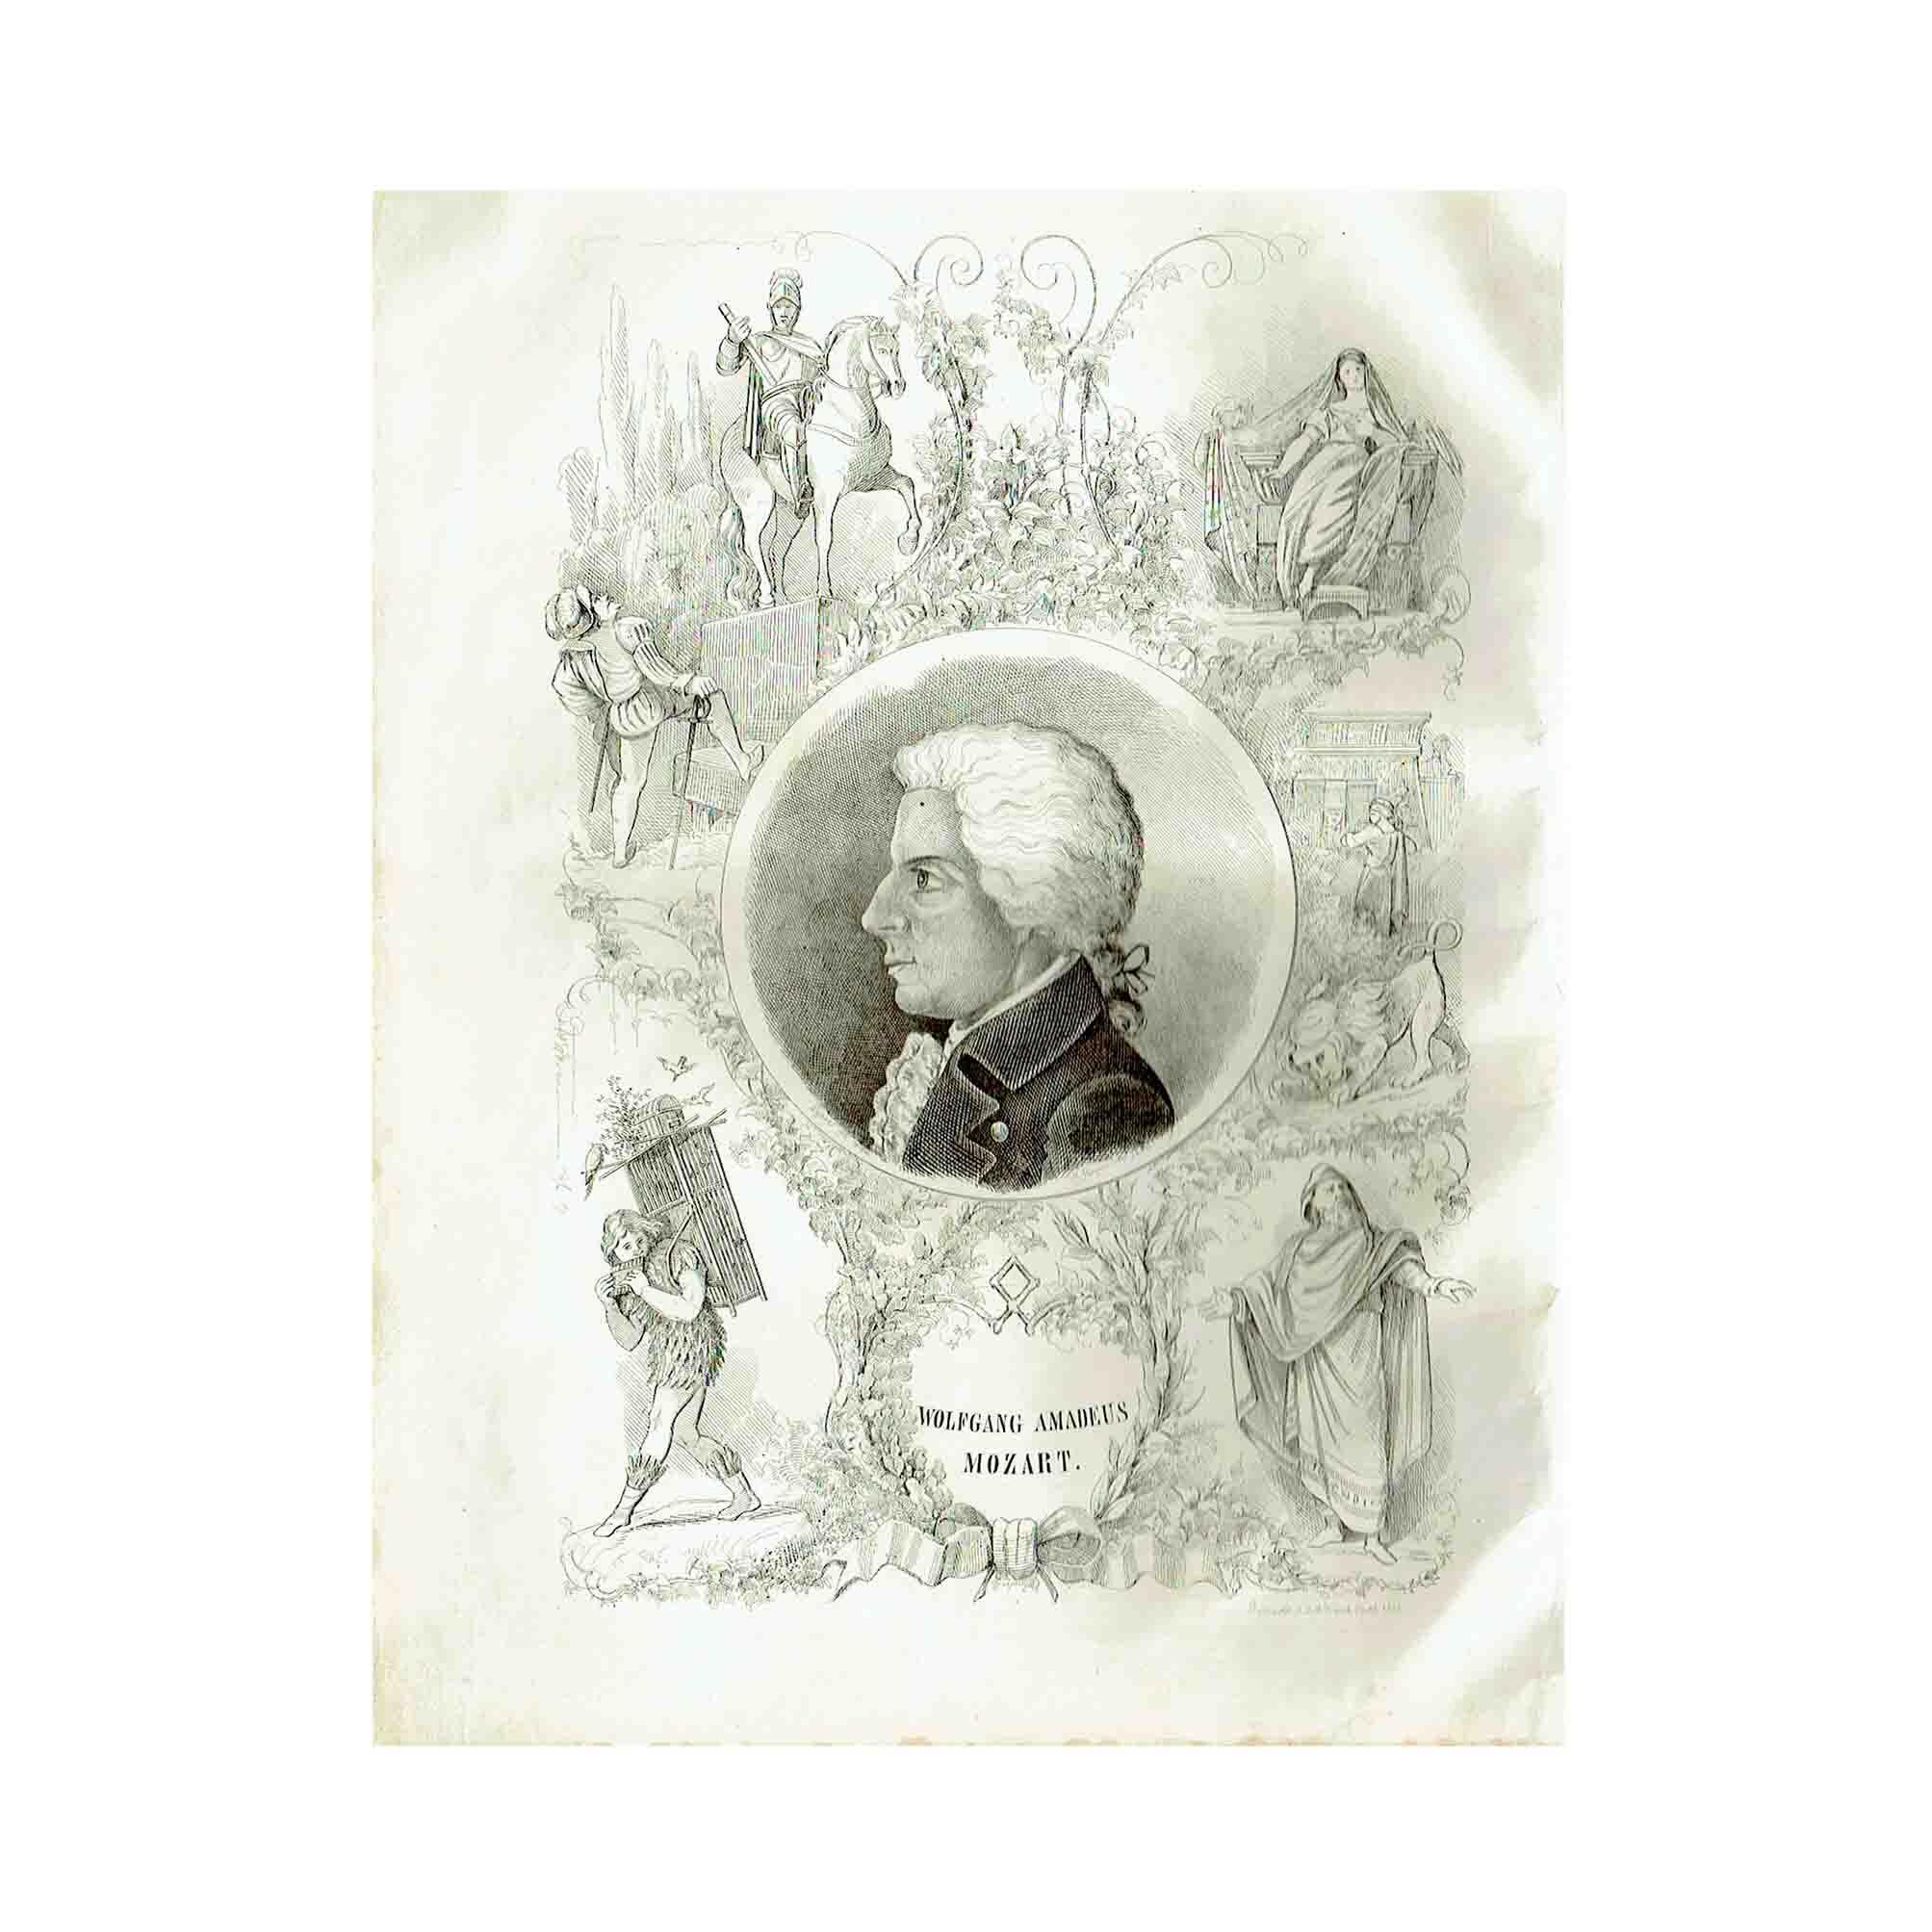 5805 Mozart Kayser Commemorative Album 1856 Portrait Mozart N